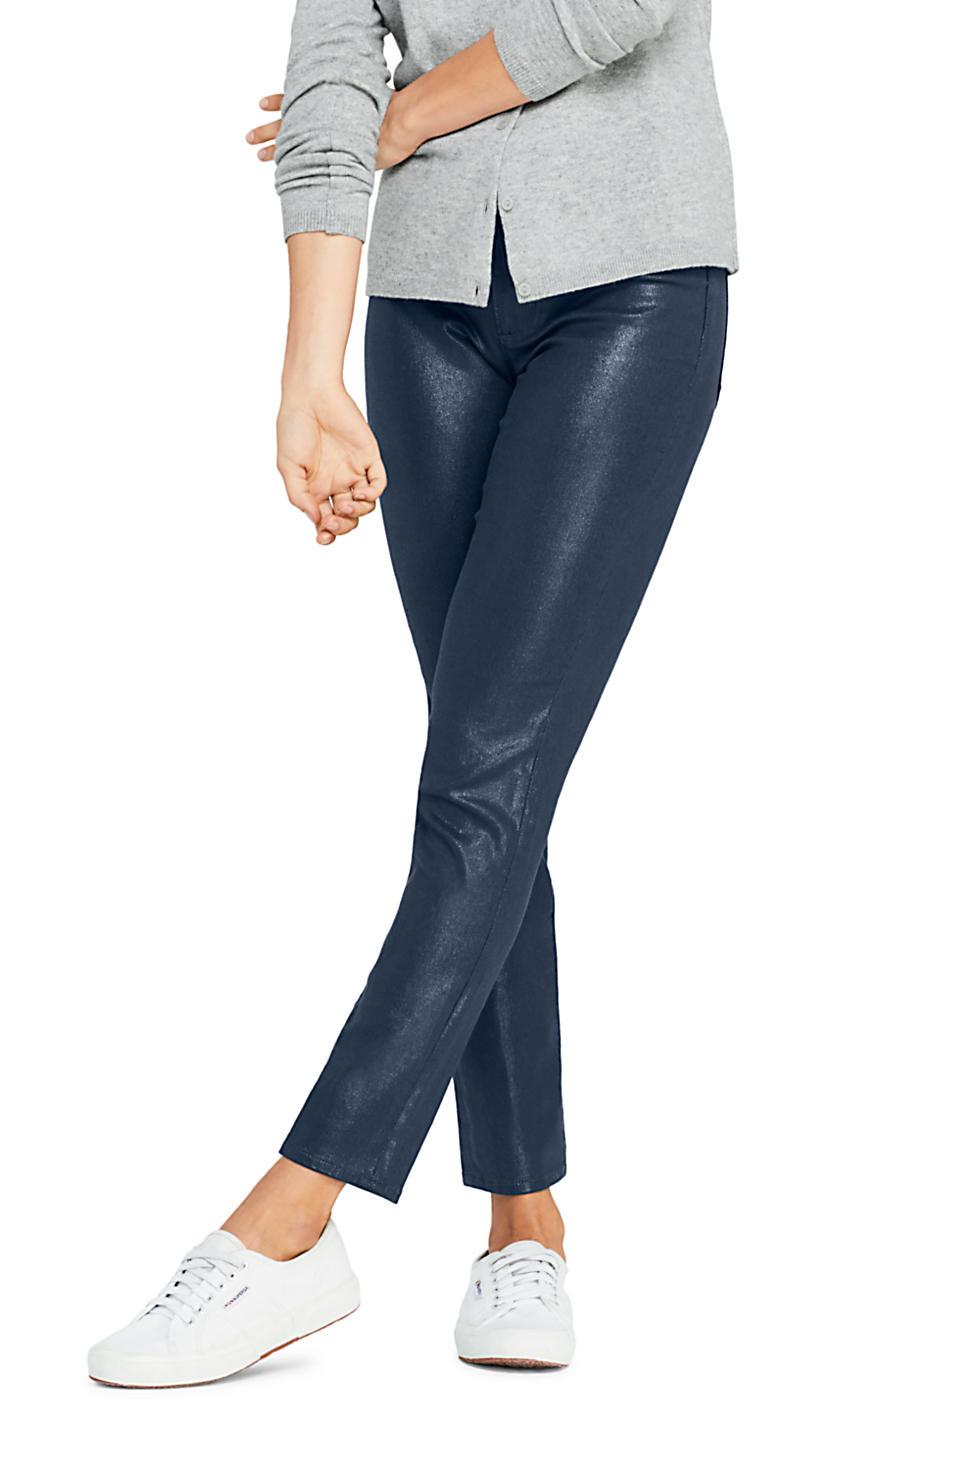 Lands' End Women's High-Rise Slim Straight Shimmer Jeans